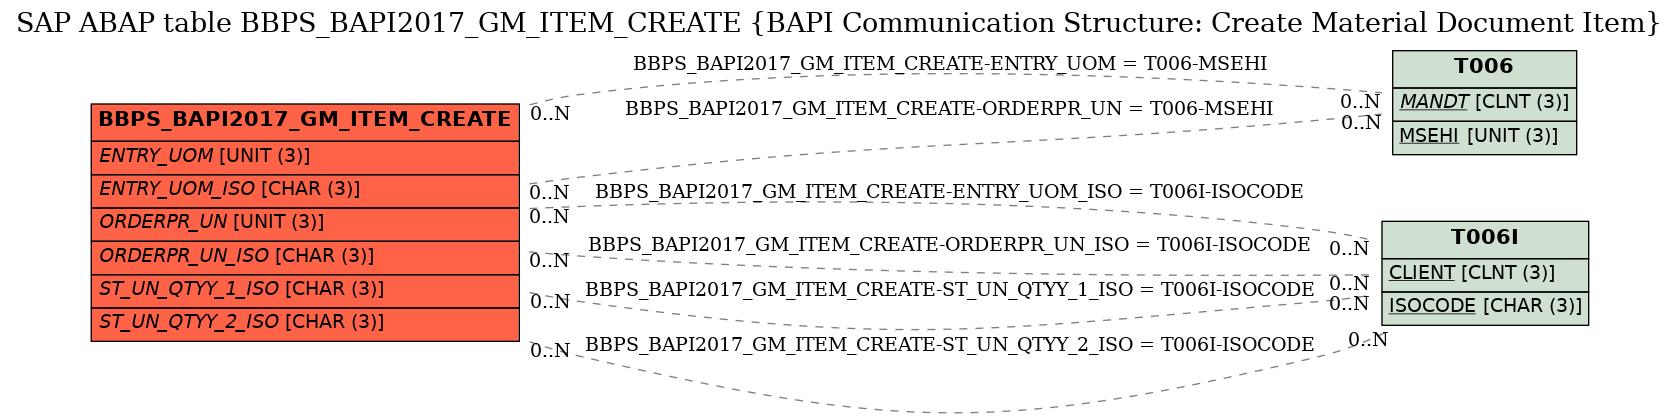 SAP ABAP Table BBPS_BAPI2017_GM_ITEM_CREATE (BAPI